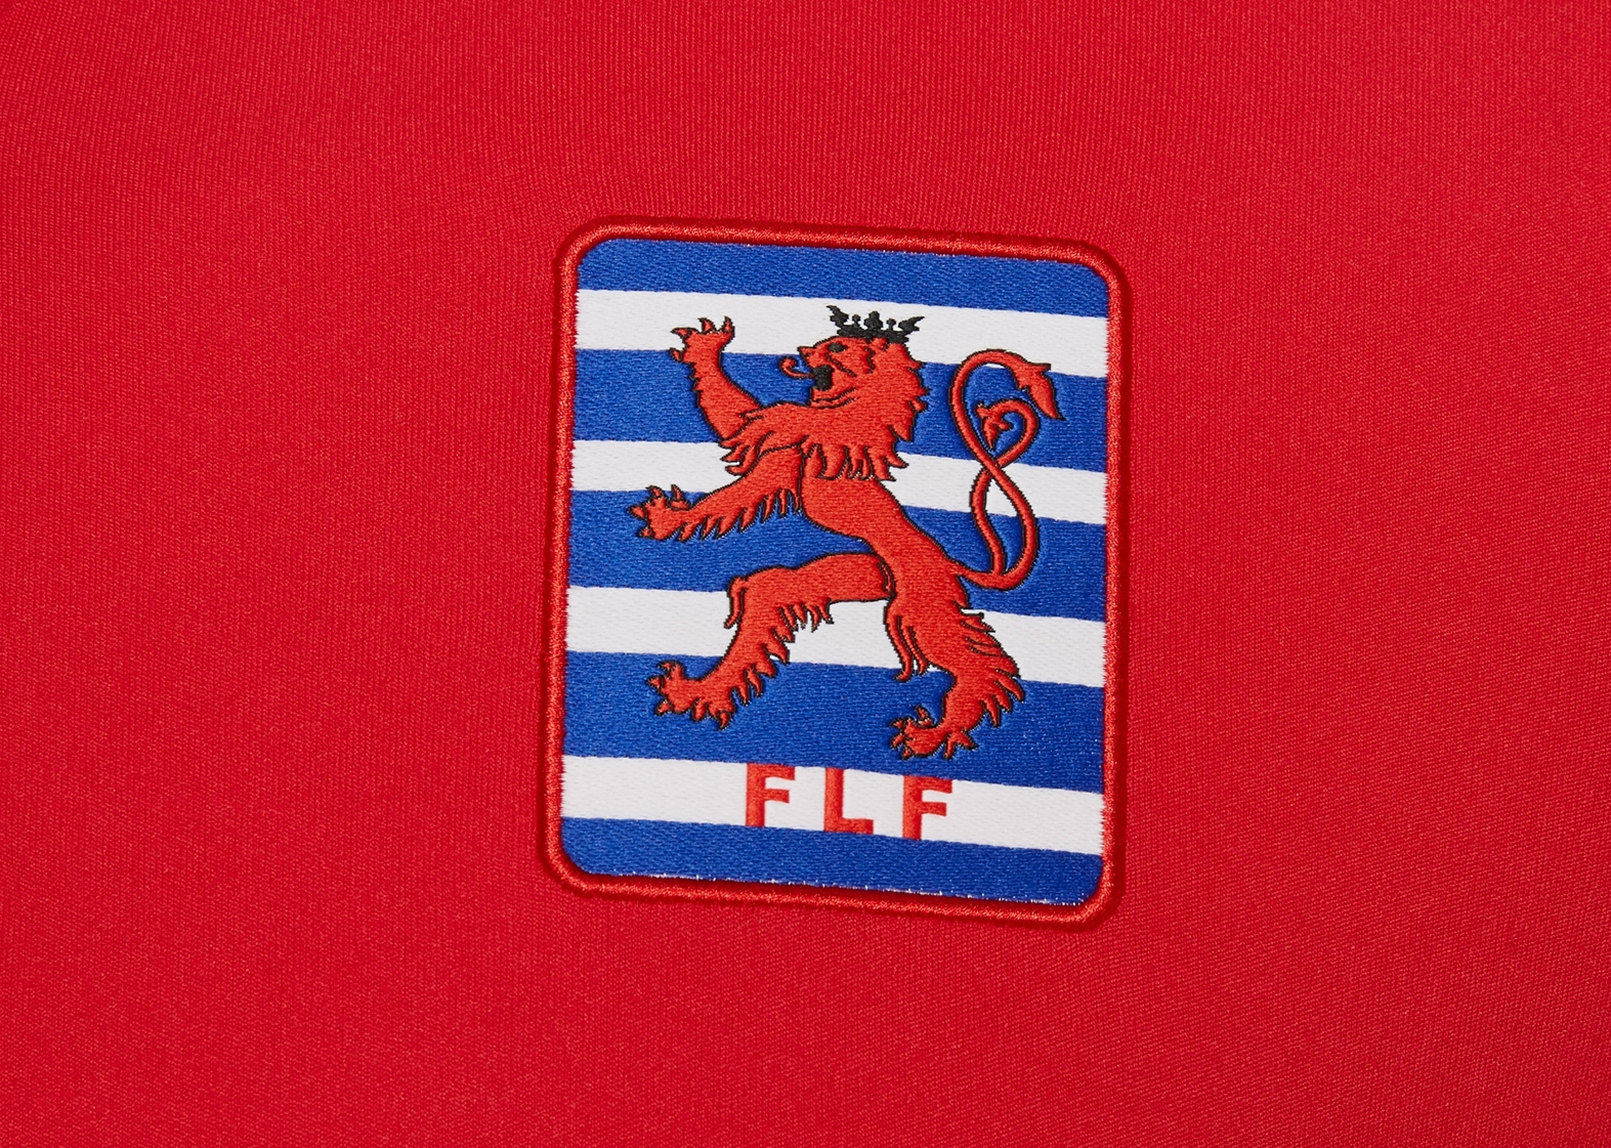 Camiseta titular de Luxemburgo 2018/19 | Imagen Macron